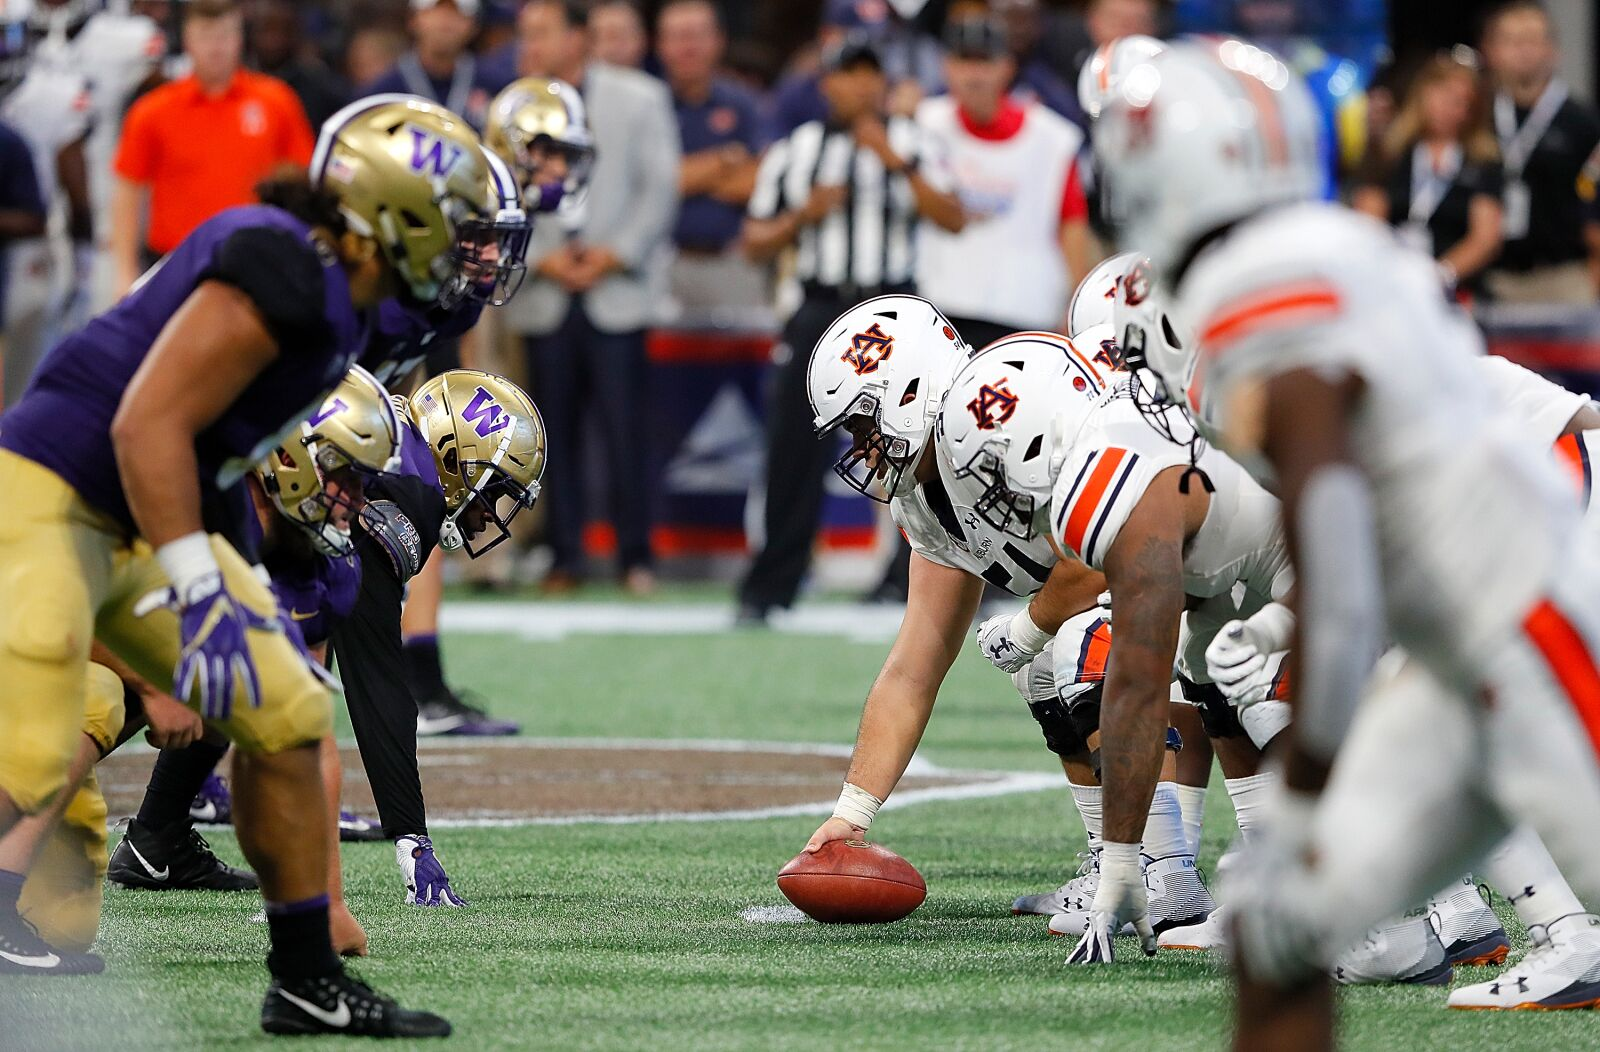 Auburn football: Detailed wish list for Tigers' Week 2 game